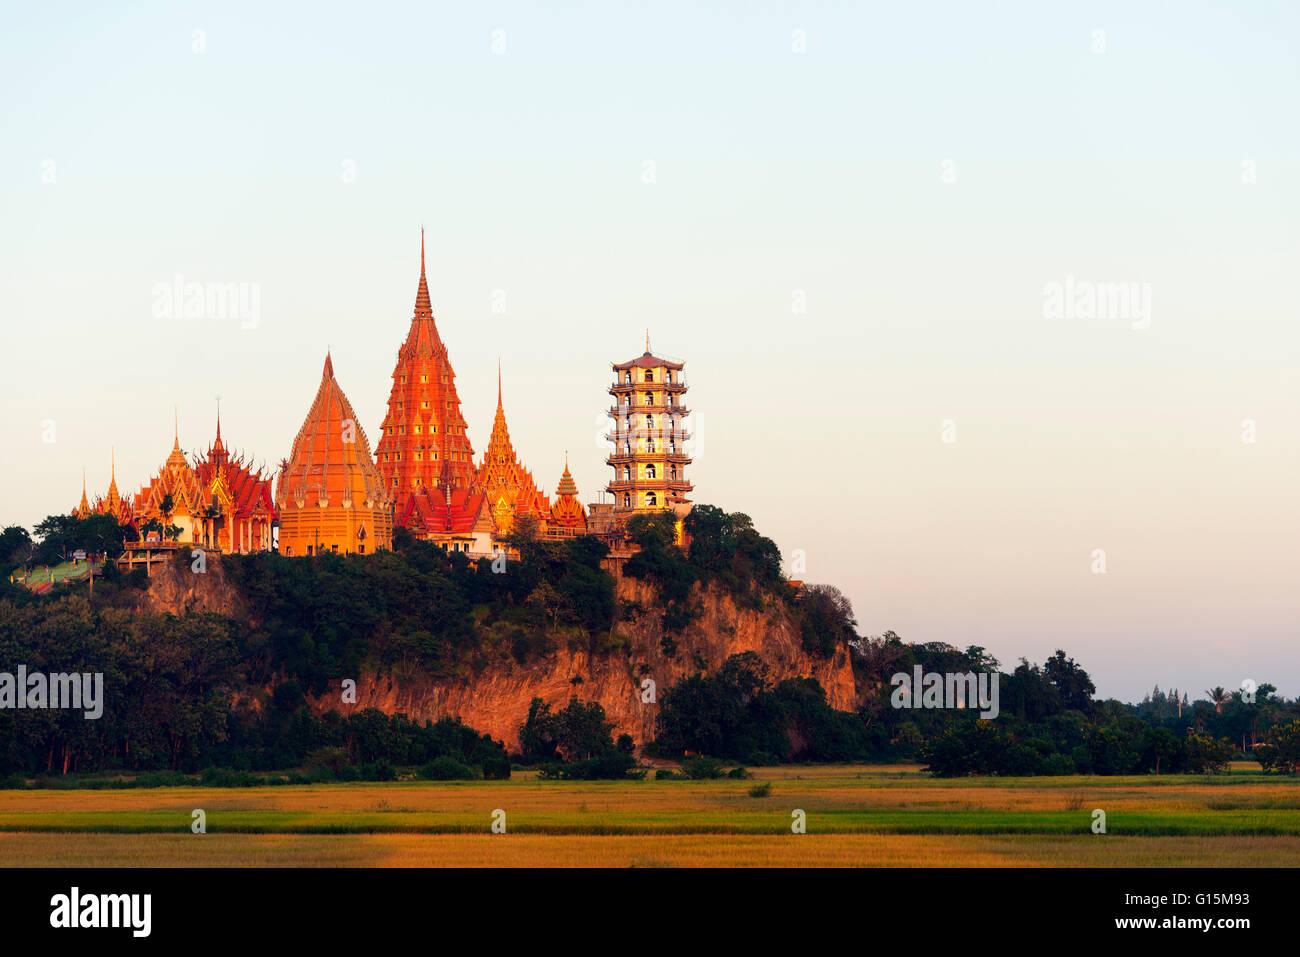 Templo Wat Tham Sua, Kanchanaburi, Tailandia, el sudeste de Asia, Asia Imagen De Stock